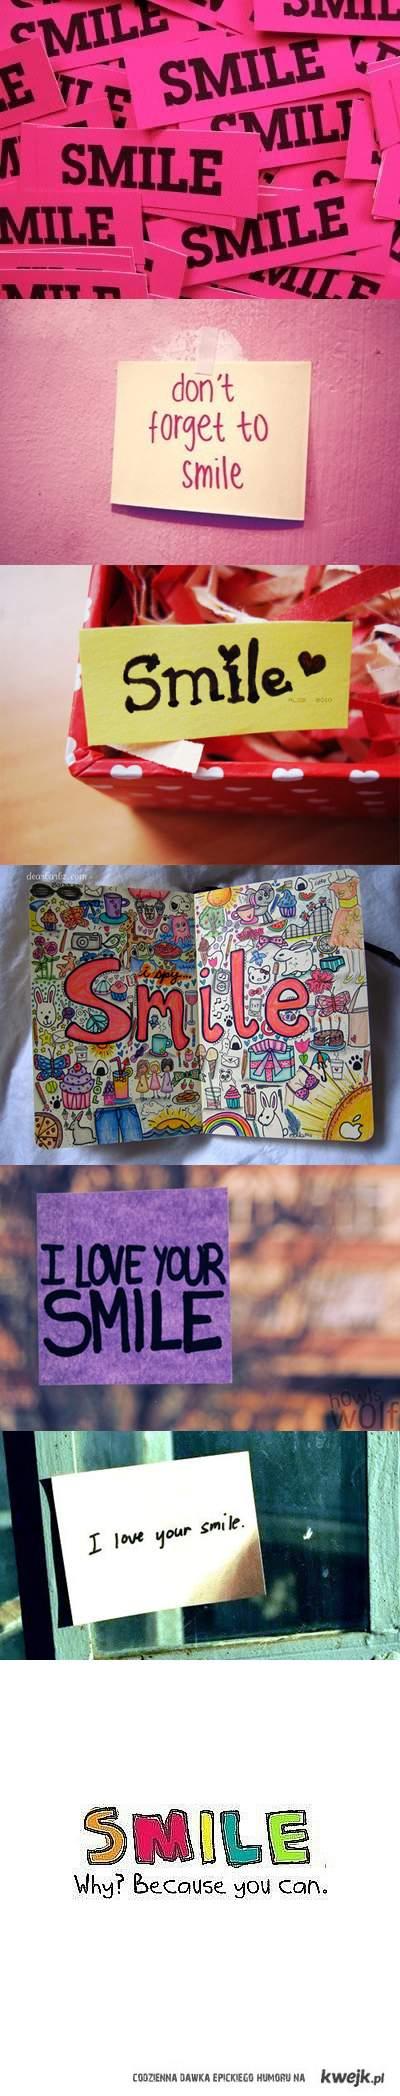 smileee :)